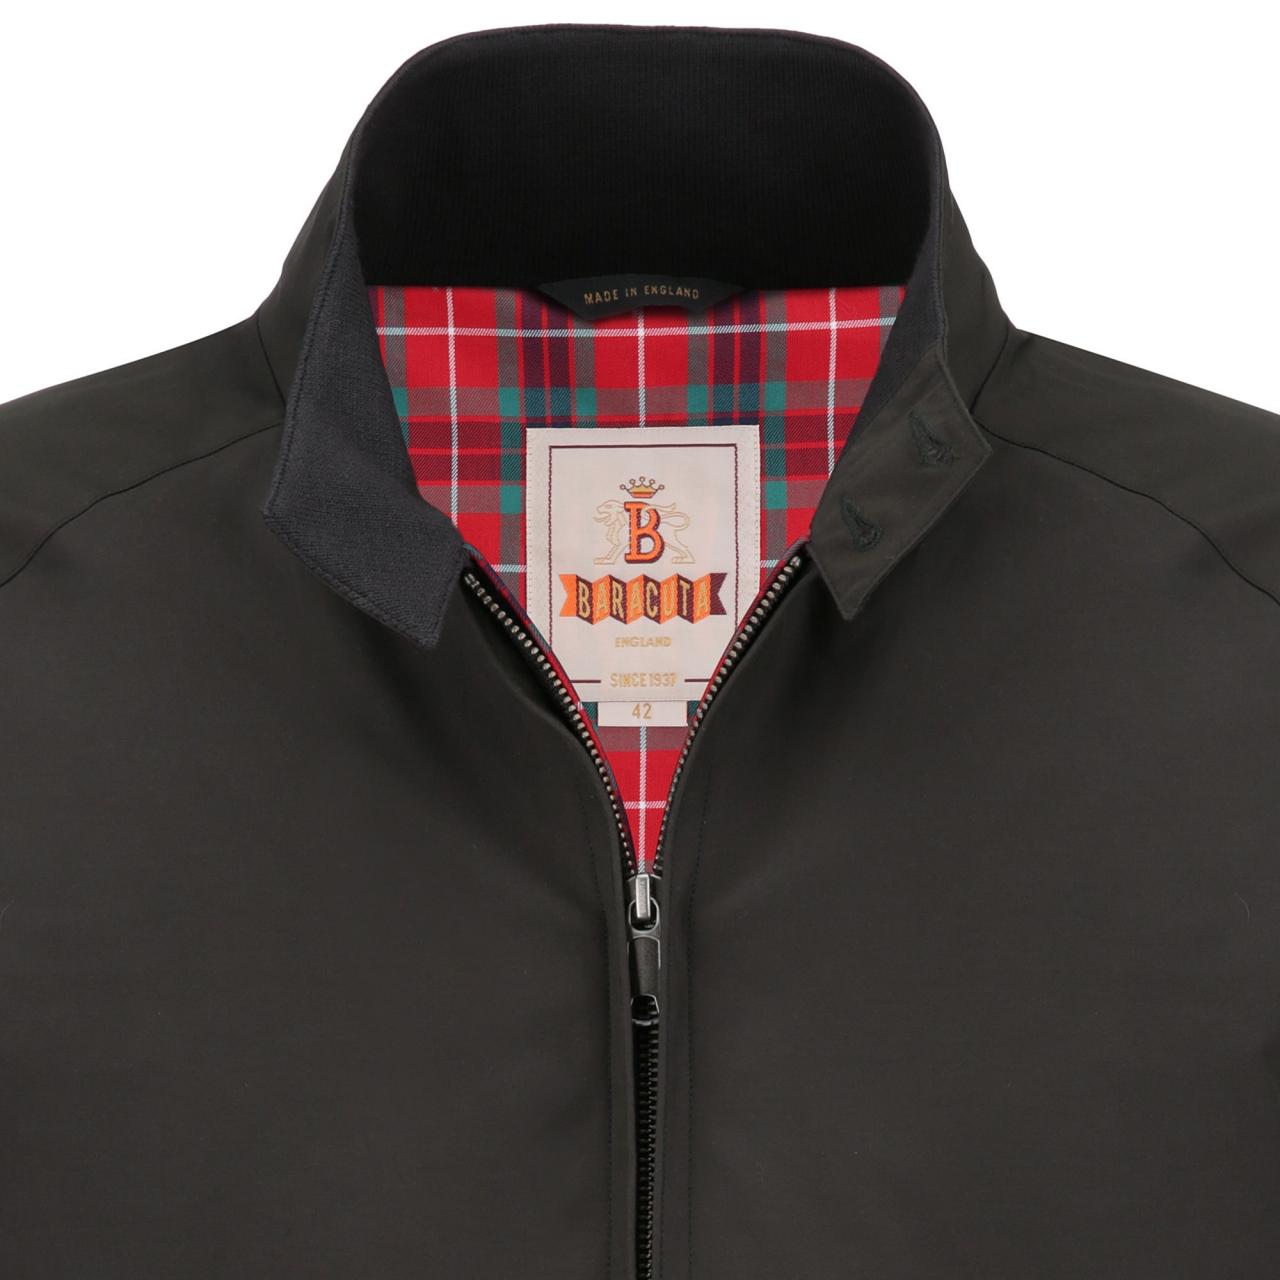 Baracuta G9 Jacke - cloth